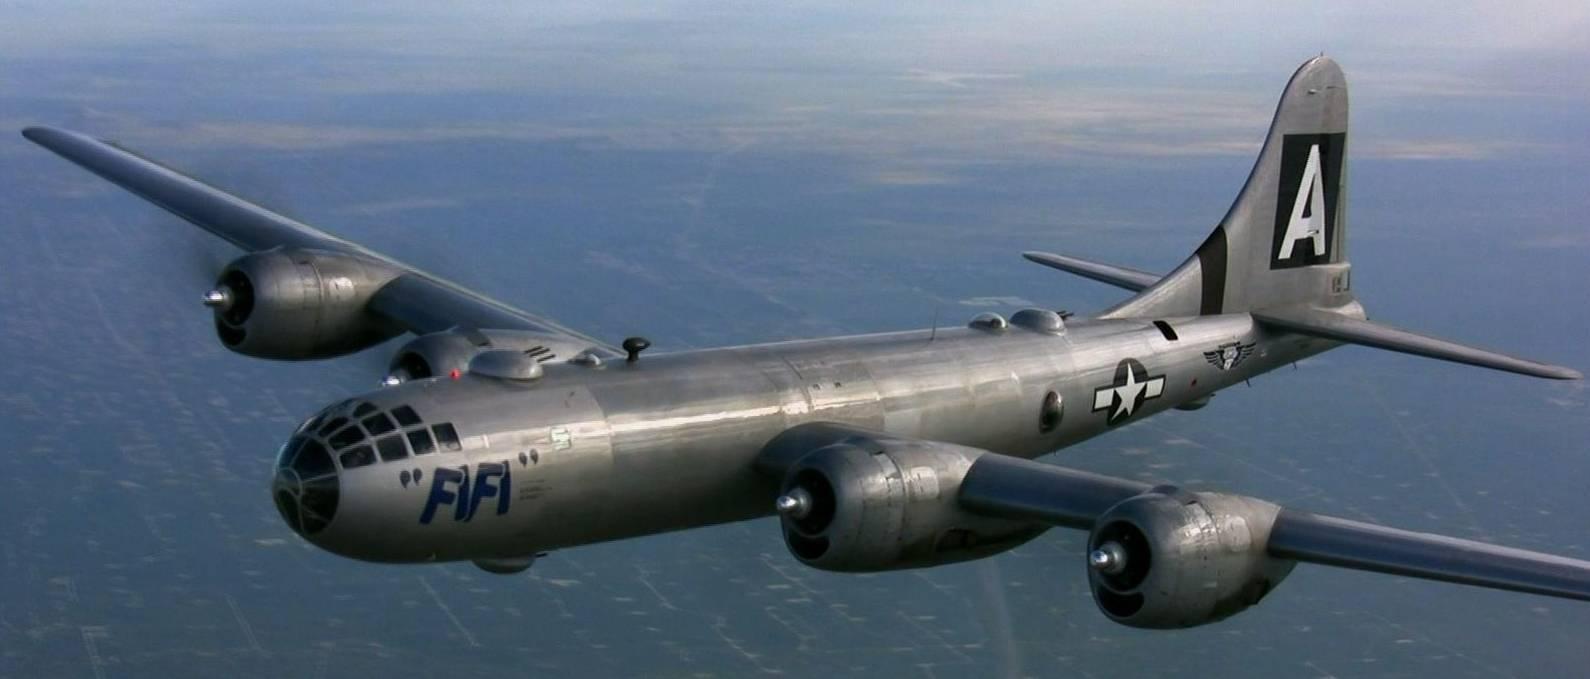 Бомбардировщик боинг b-29 «суперкрепость»   армии и солдаты. военная энциклопедия